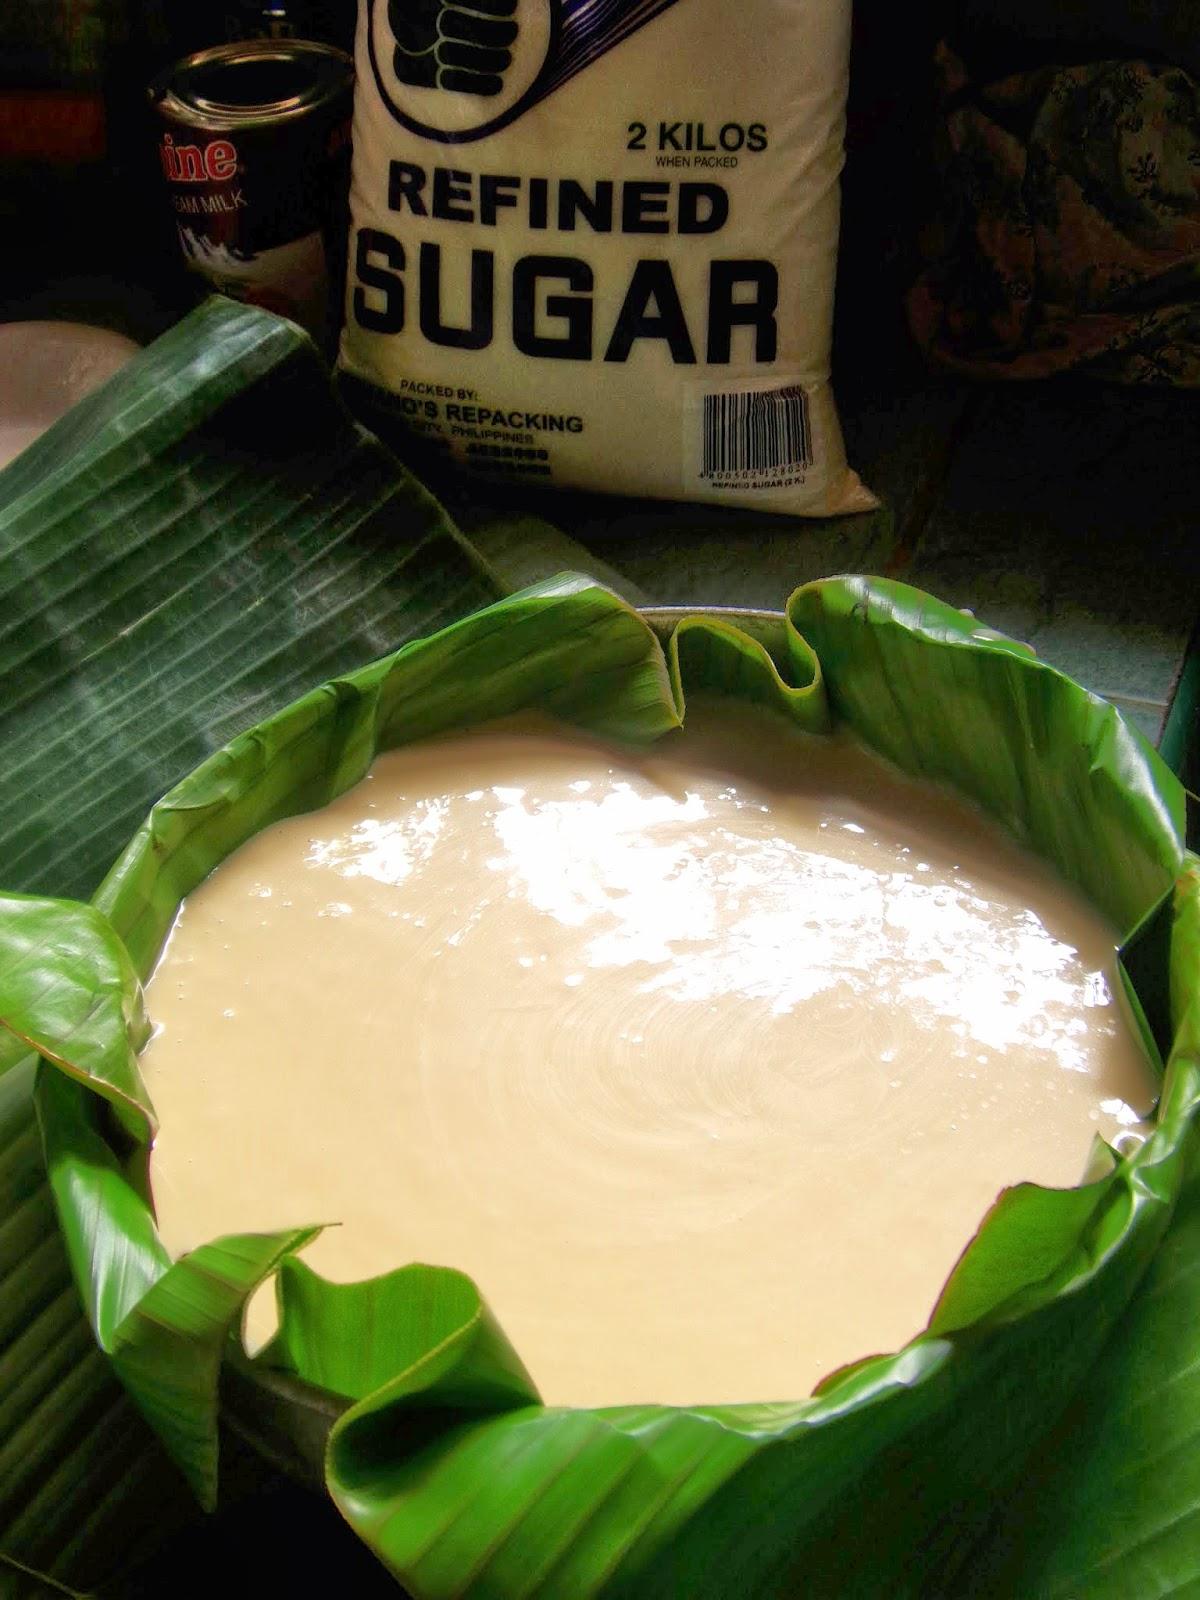 filipino dessert recipes, filipino desserts, kakanin recipe, easy to make desserts, philippine food, filipino dessert, filipino foods, filipino dishes